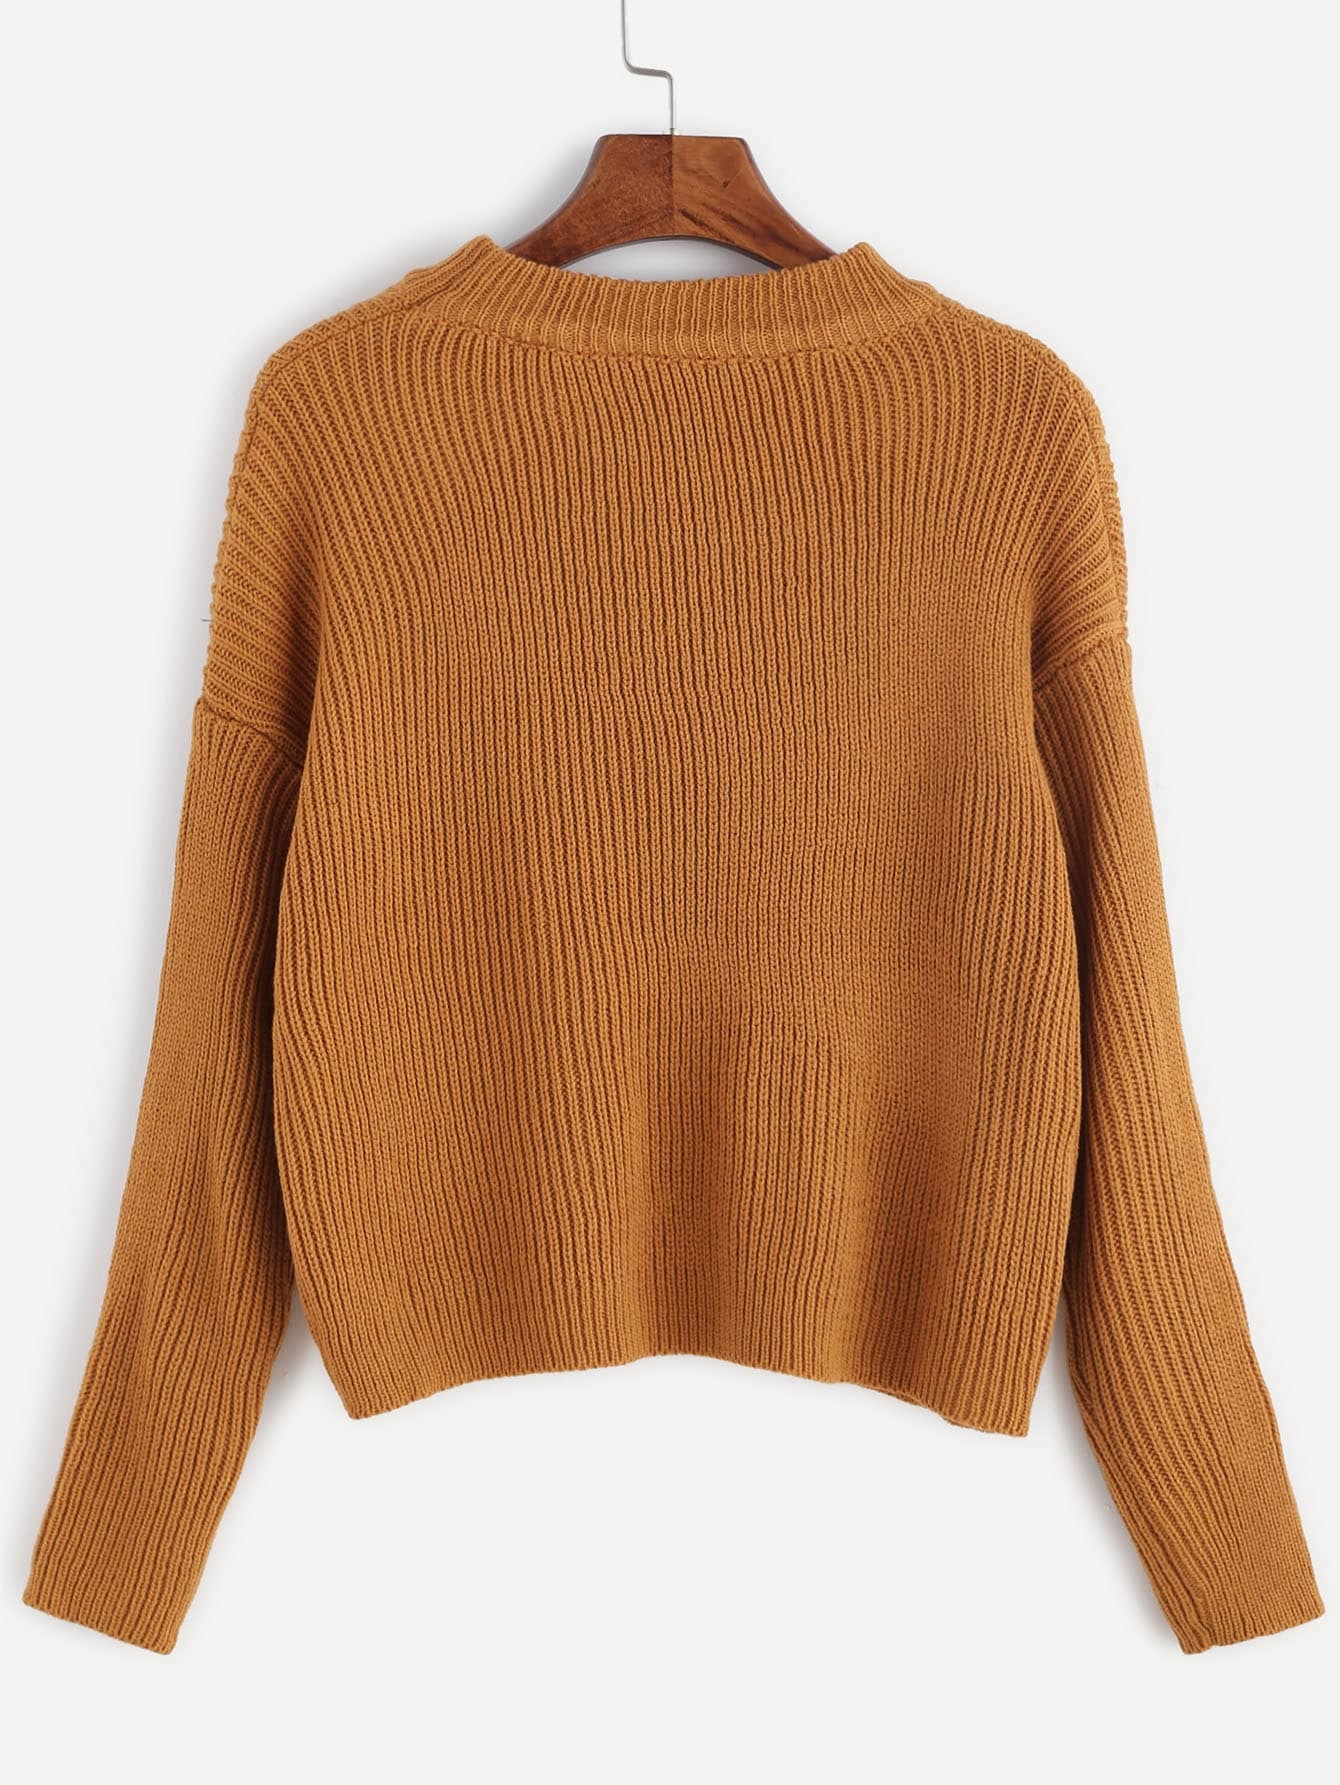 sweater161027033_2